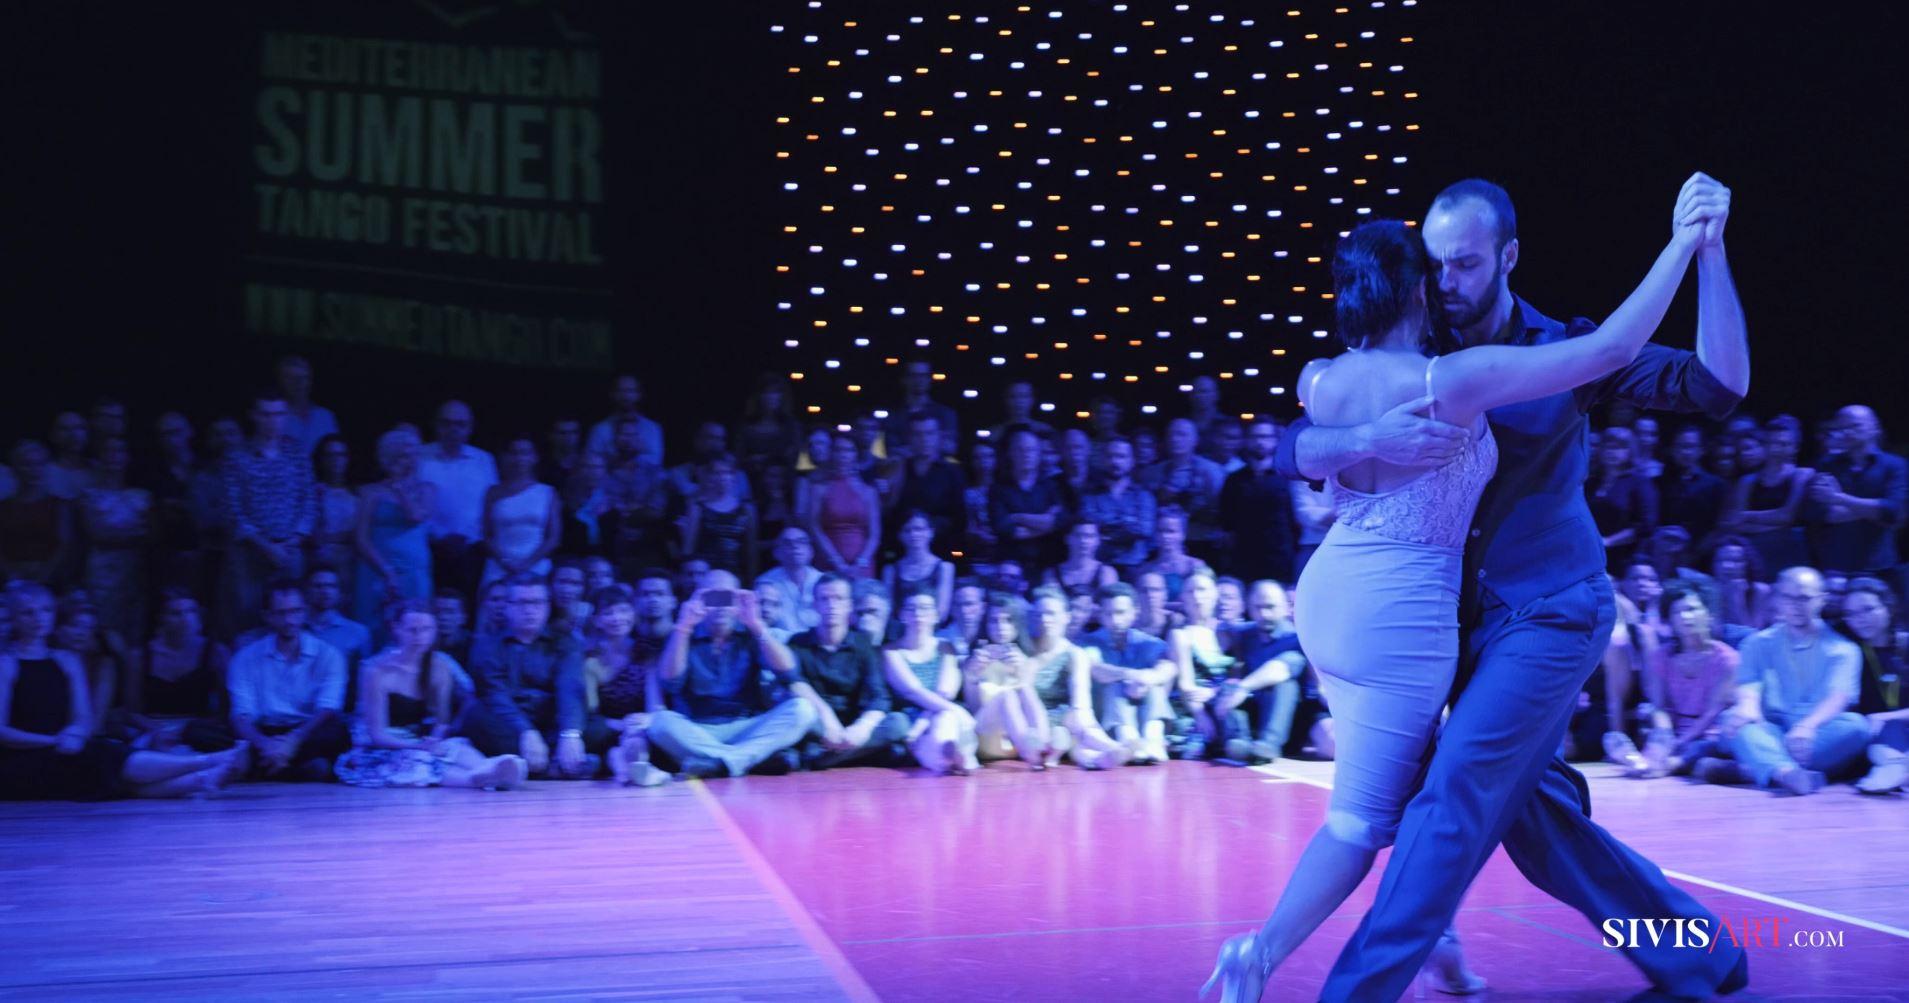 Sivis'art Videomaker presents Pablo Rodriguez & Corina Herrera at Mediterranean Summer Tango Festival